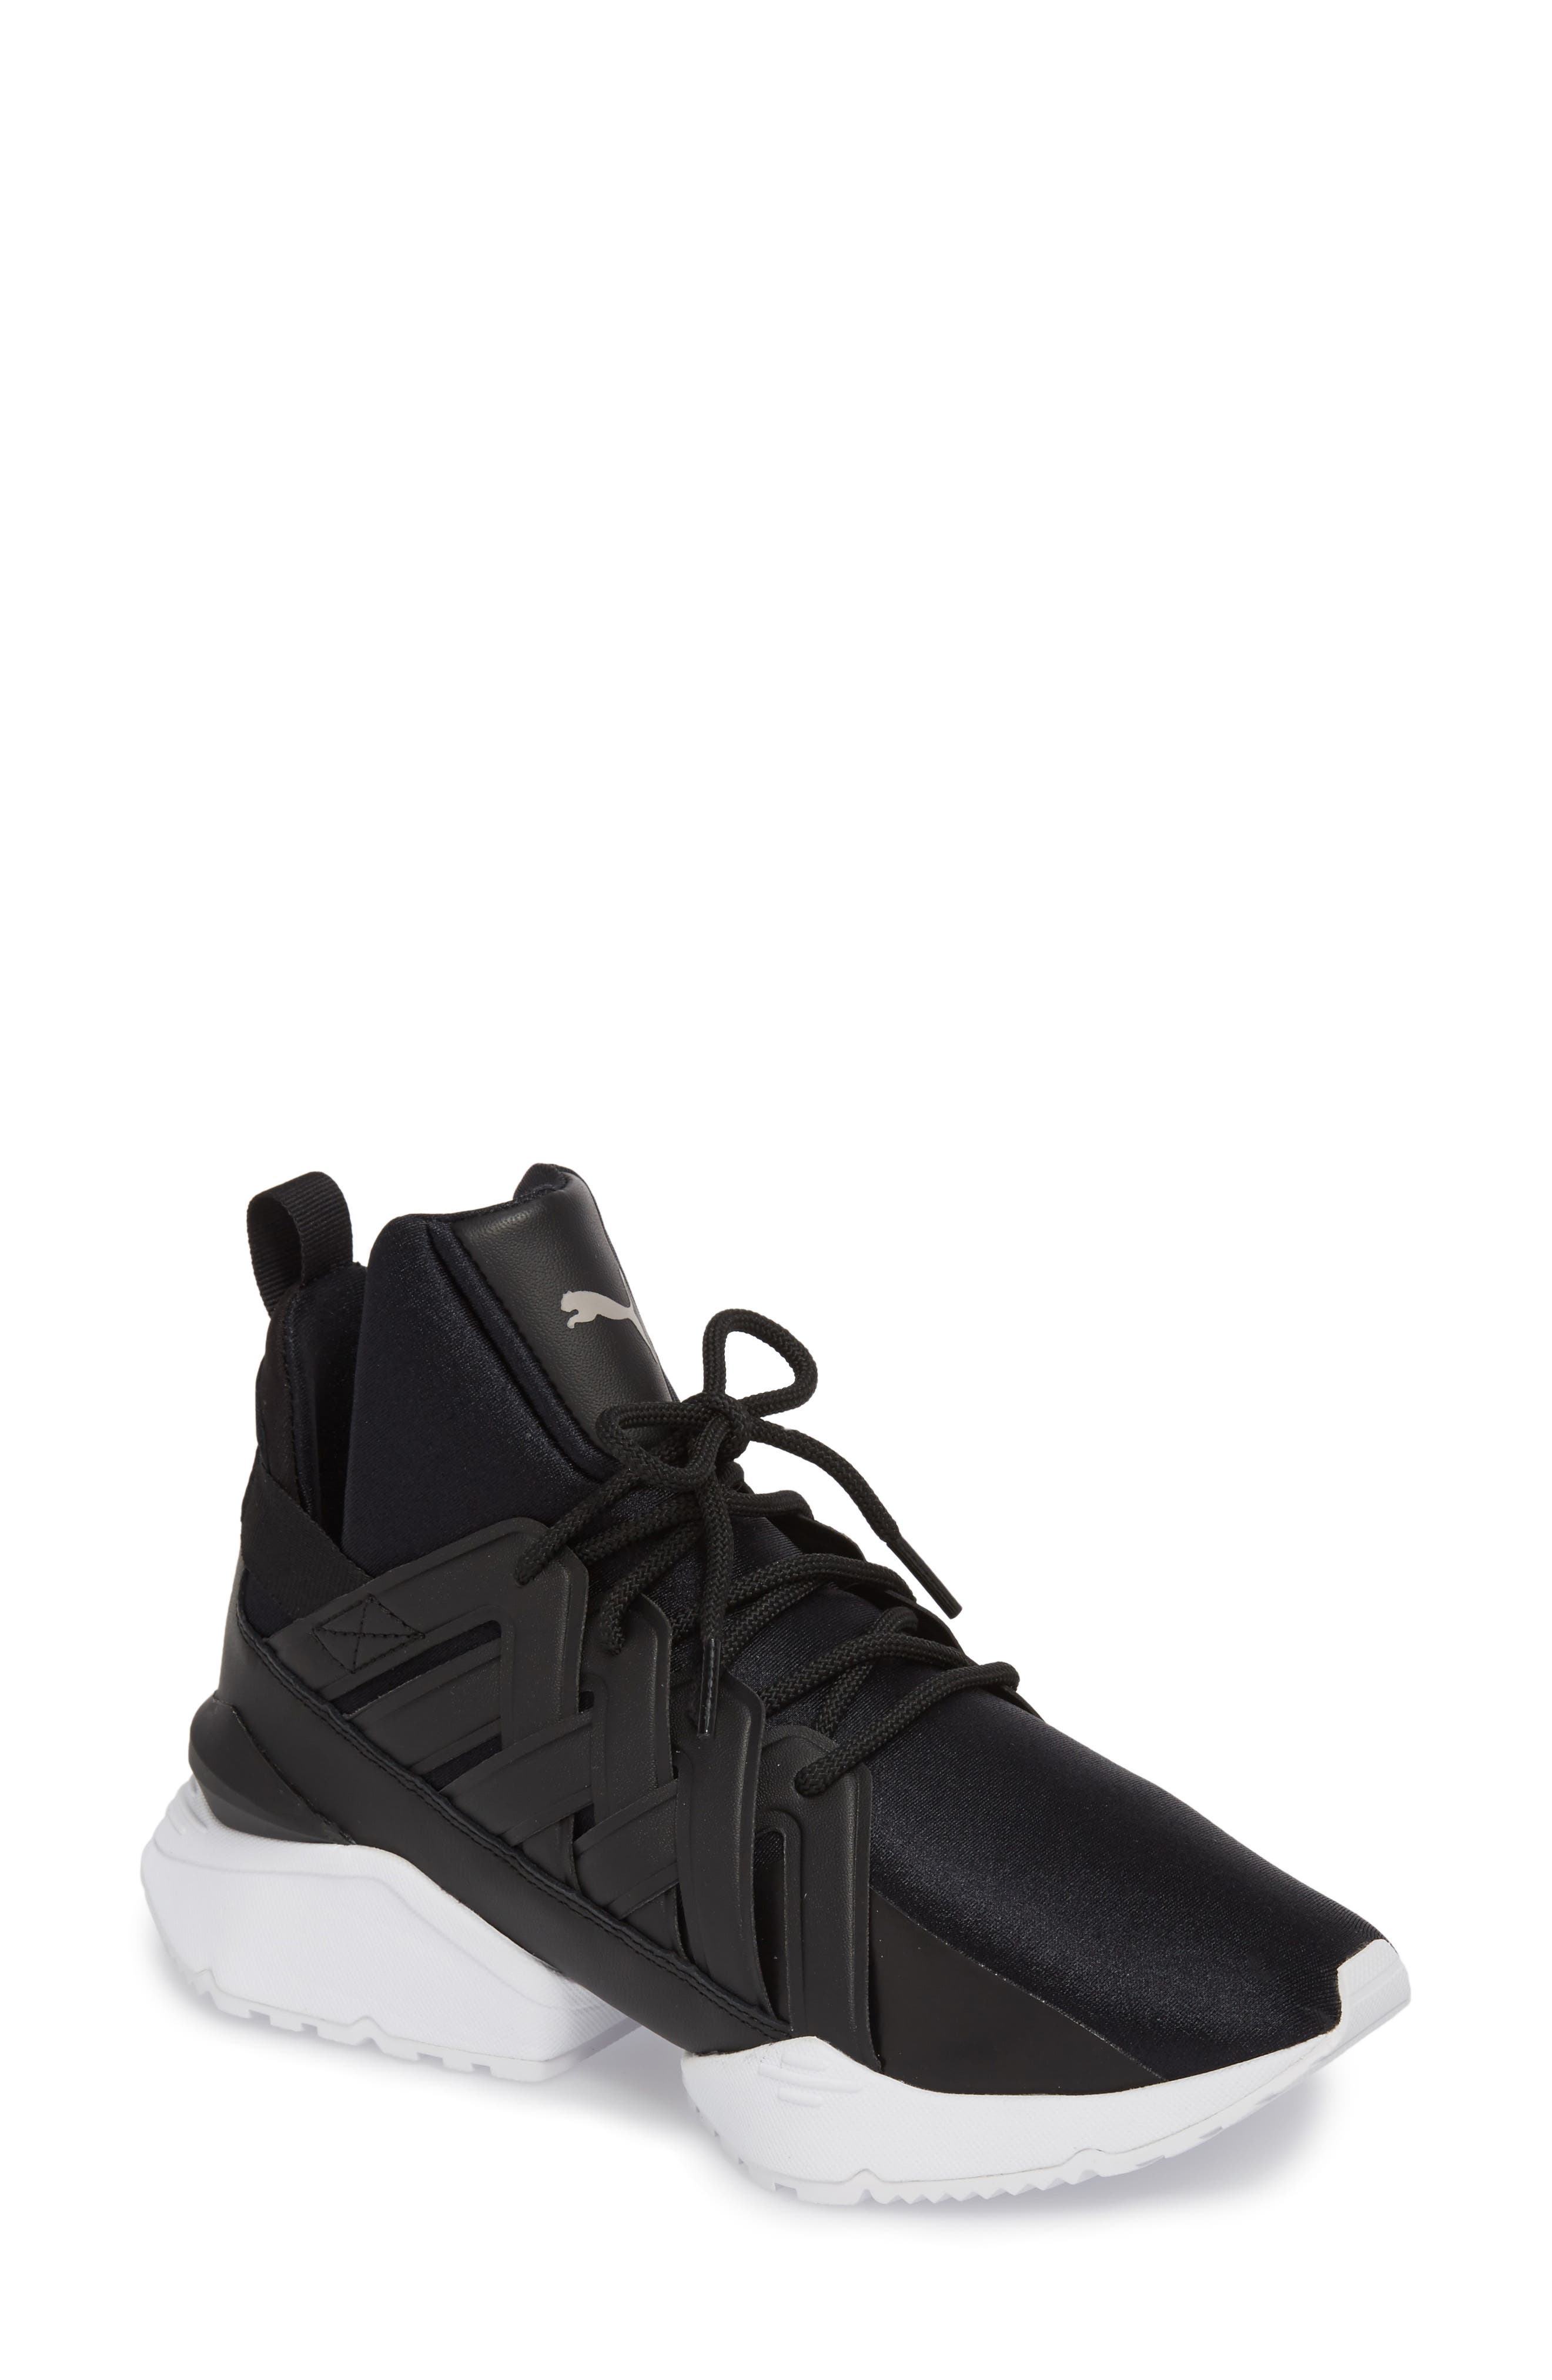 Muse Echo Satin En Pointe High Top Sneaker,                         Main,                         color, Puma Black/ Puma White